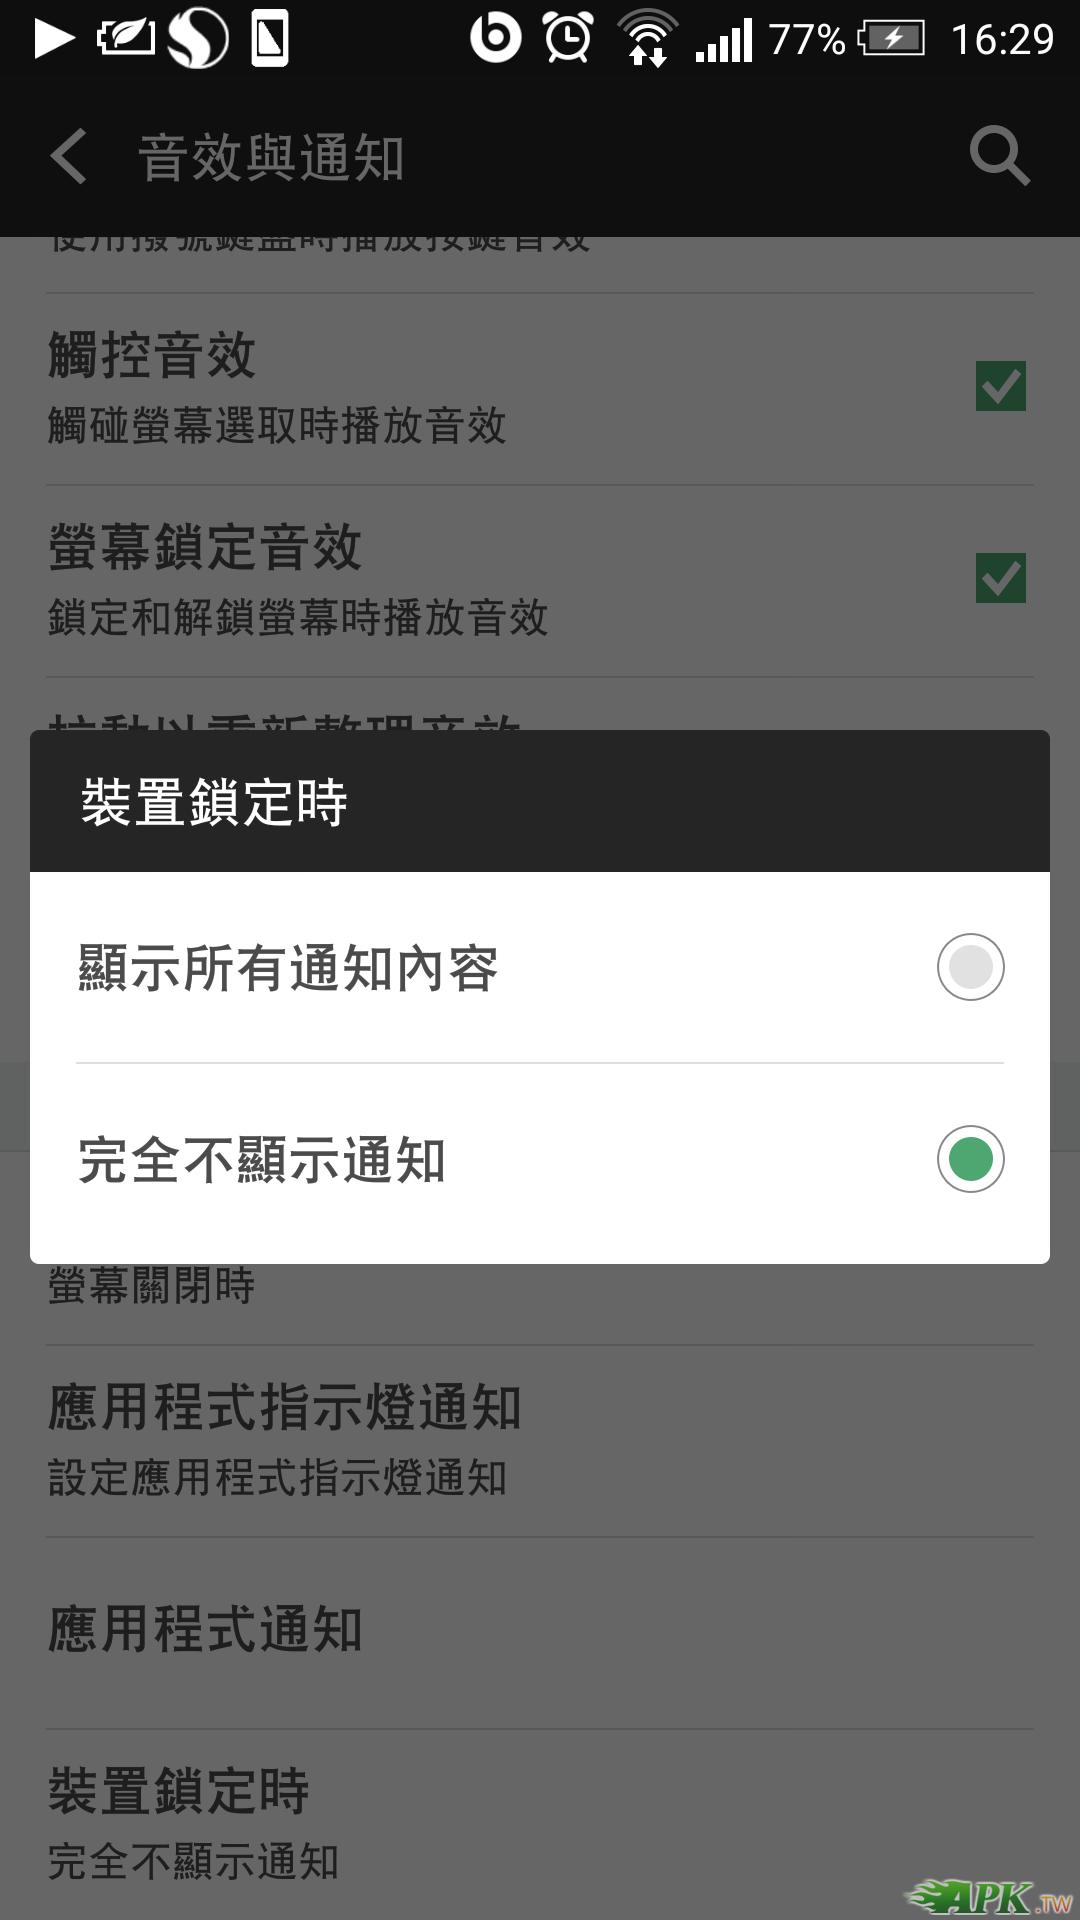 Screenshot_2015-02-28-16-29-41[1].png